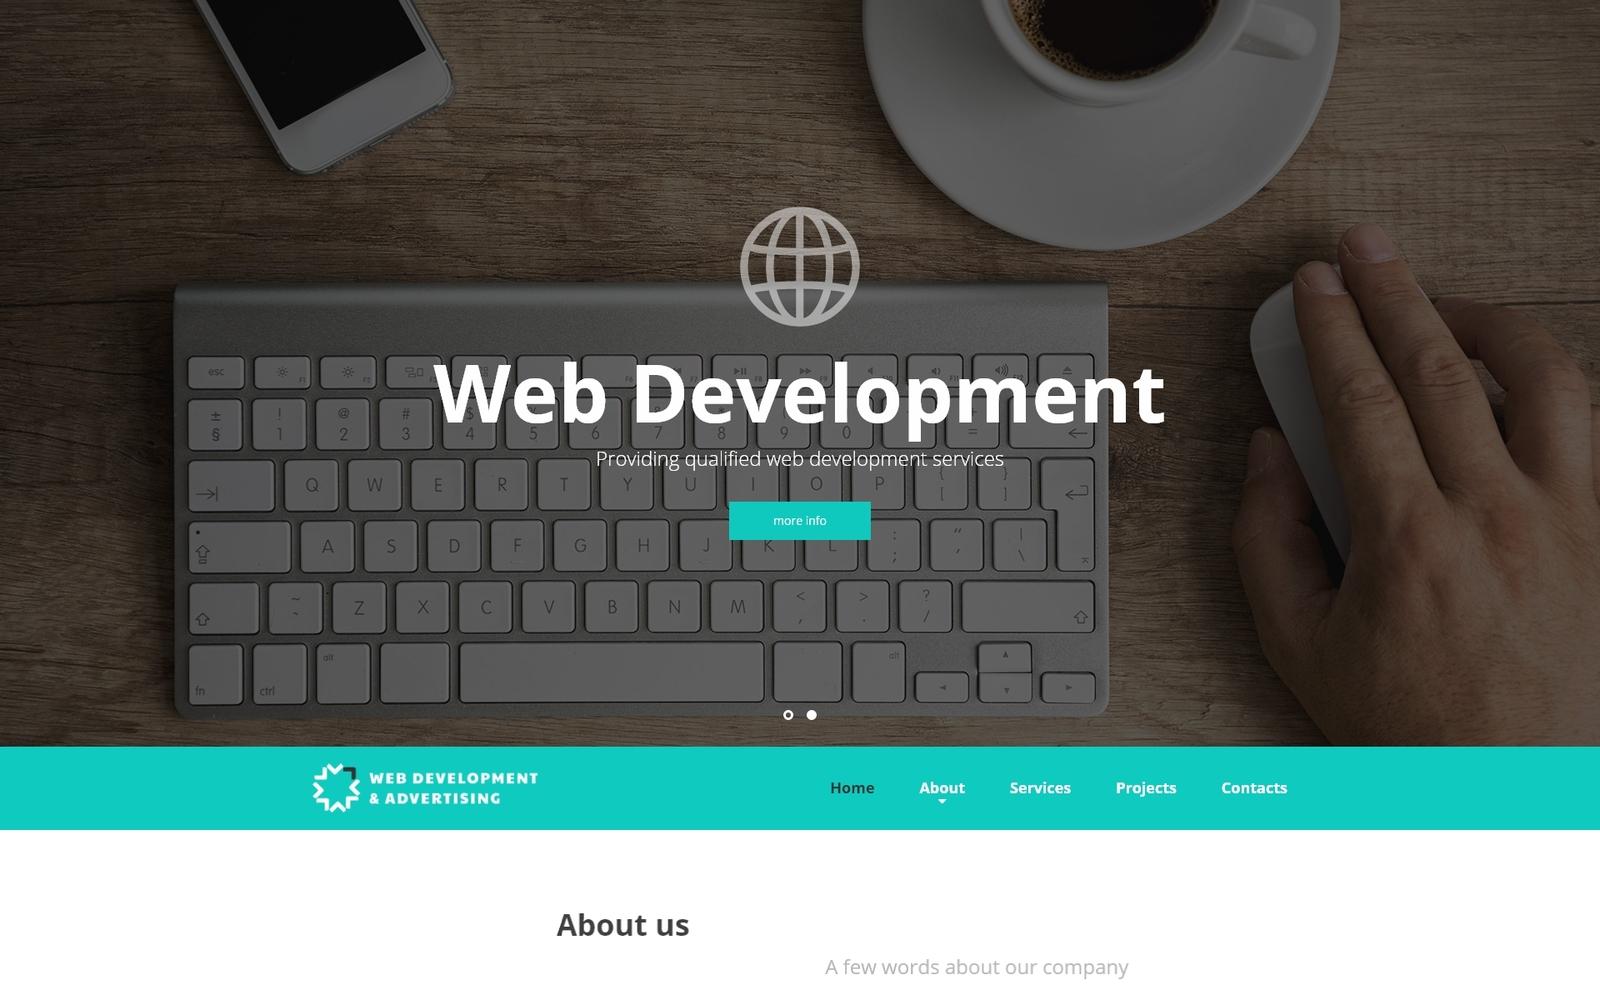 Responsive Web Development & Advertising - Web Development Responsive Web Sitesi #52537